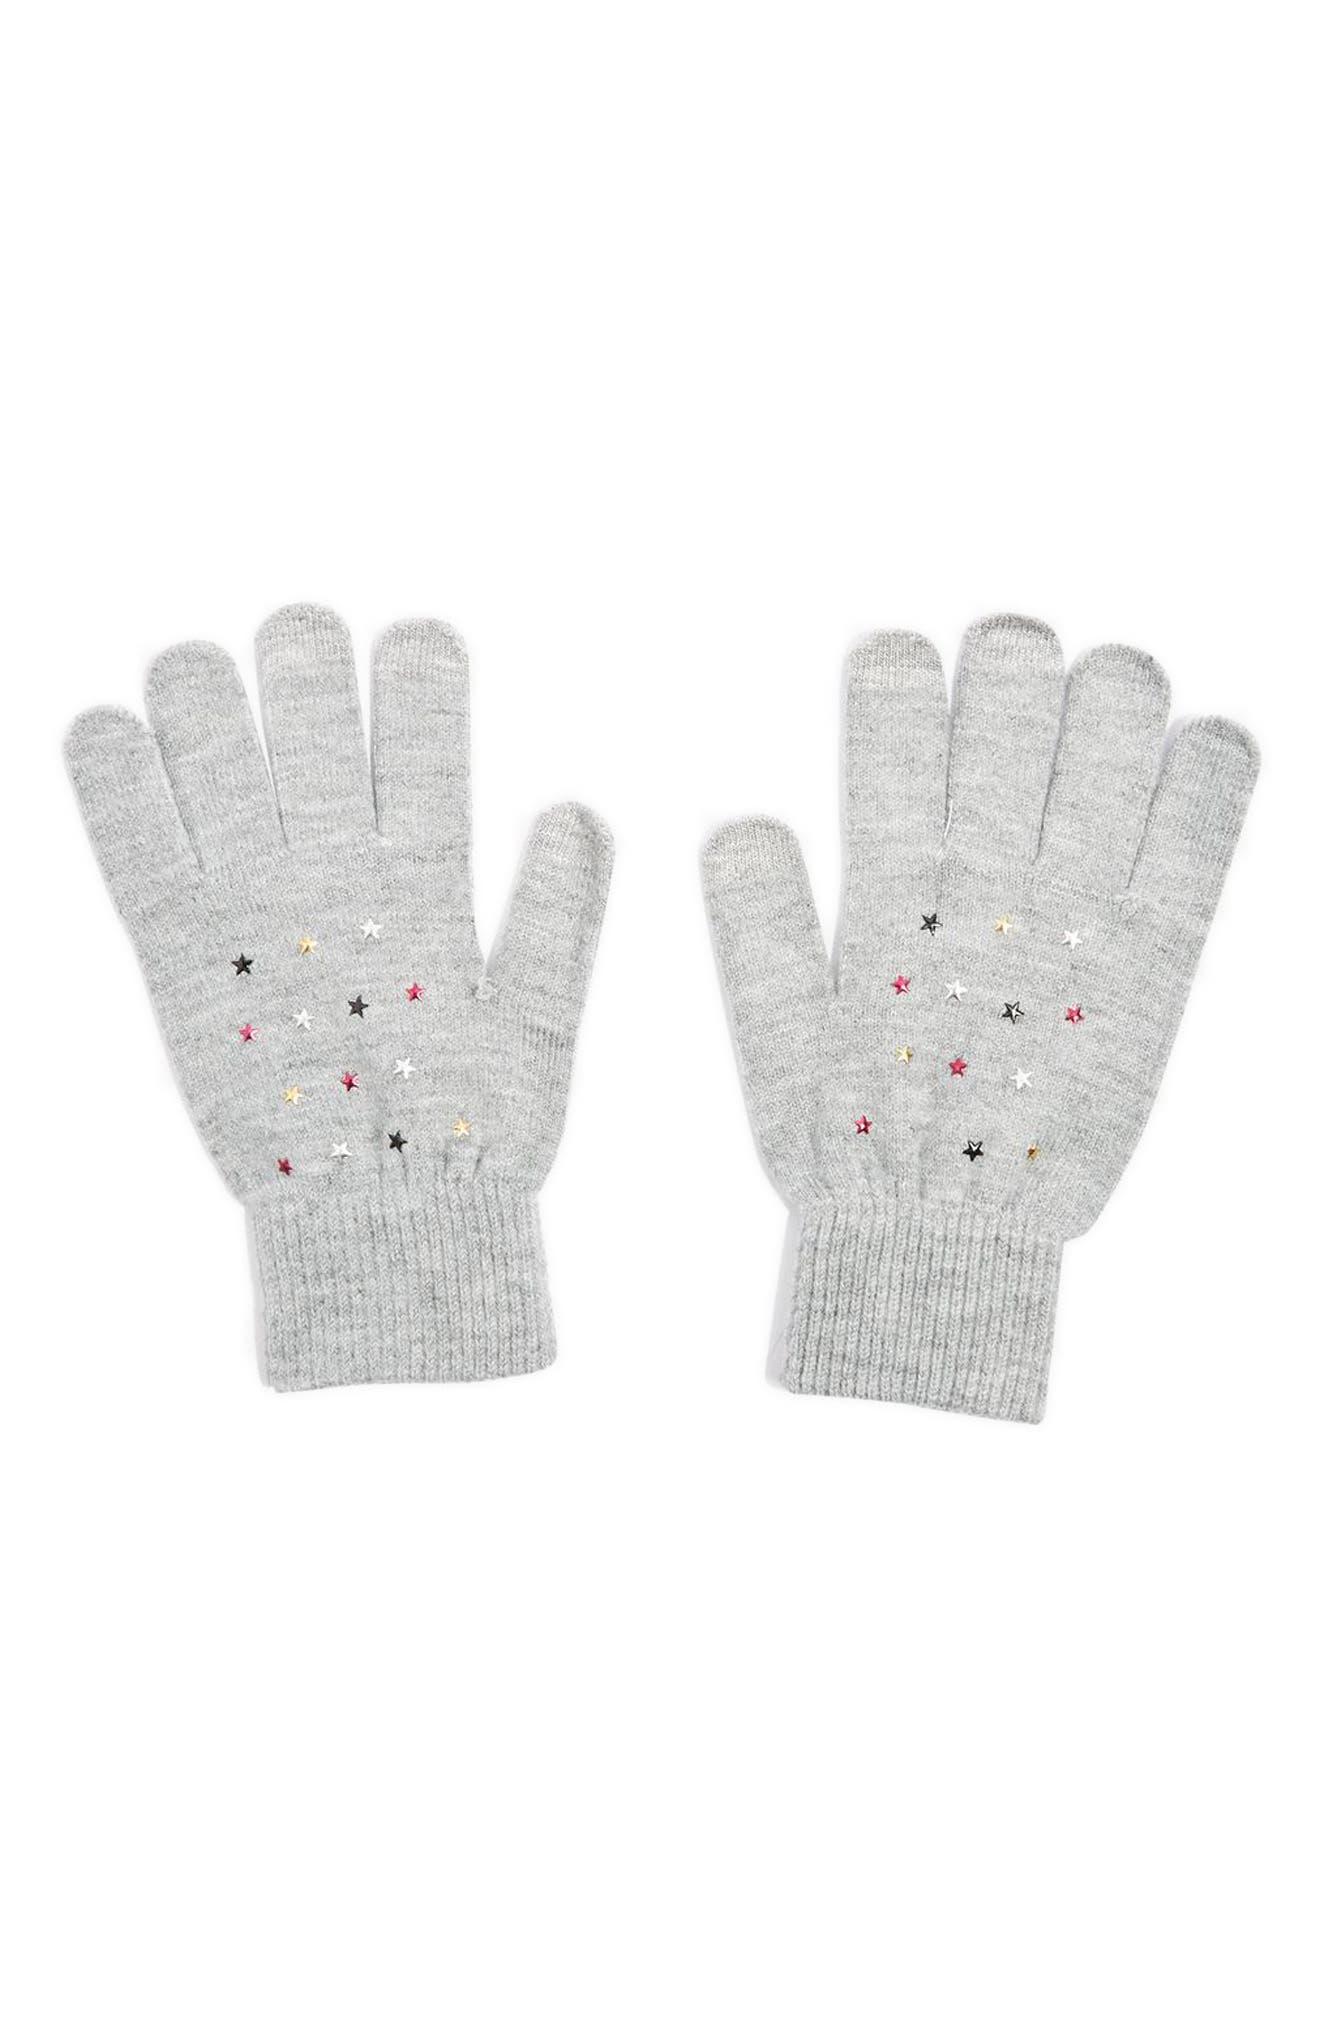 Topshop Knit Star Gloves